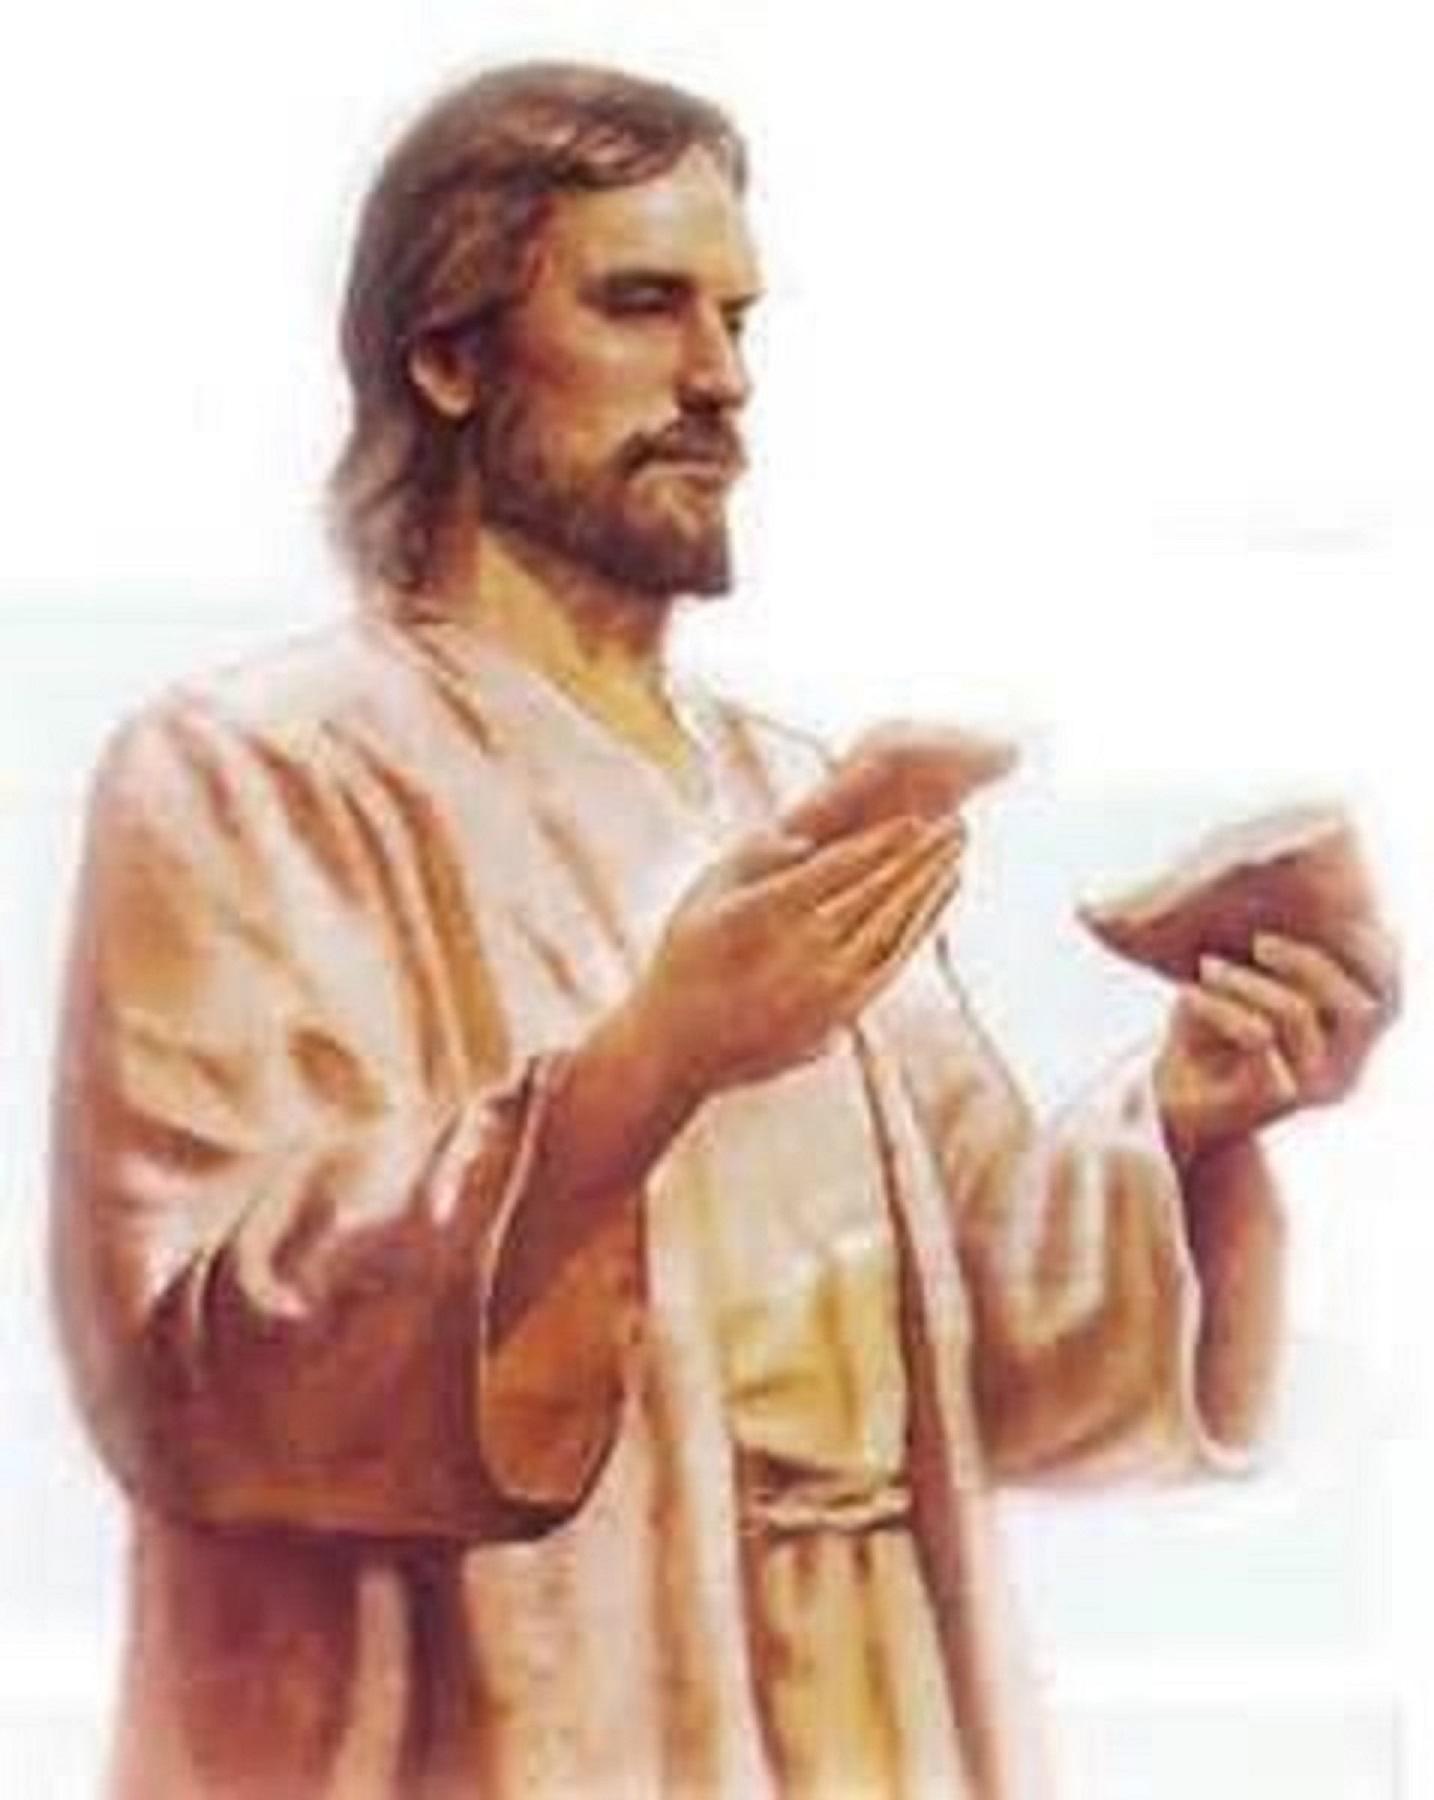 Jésus pain de vie 1.jpg